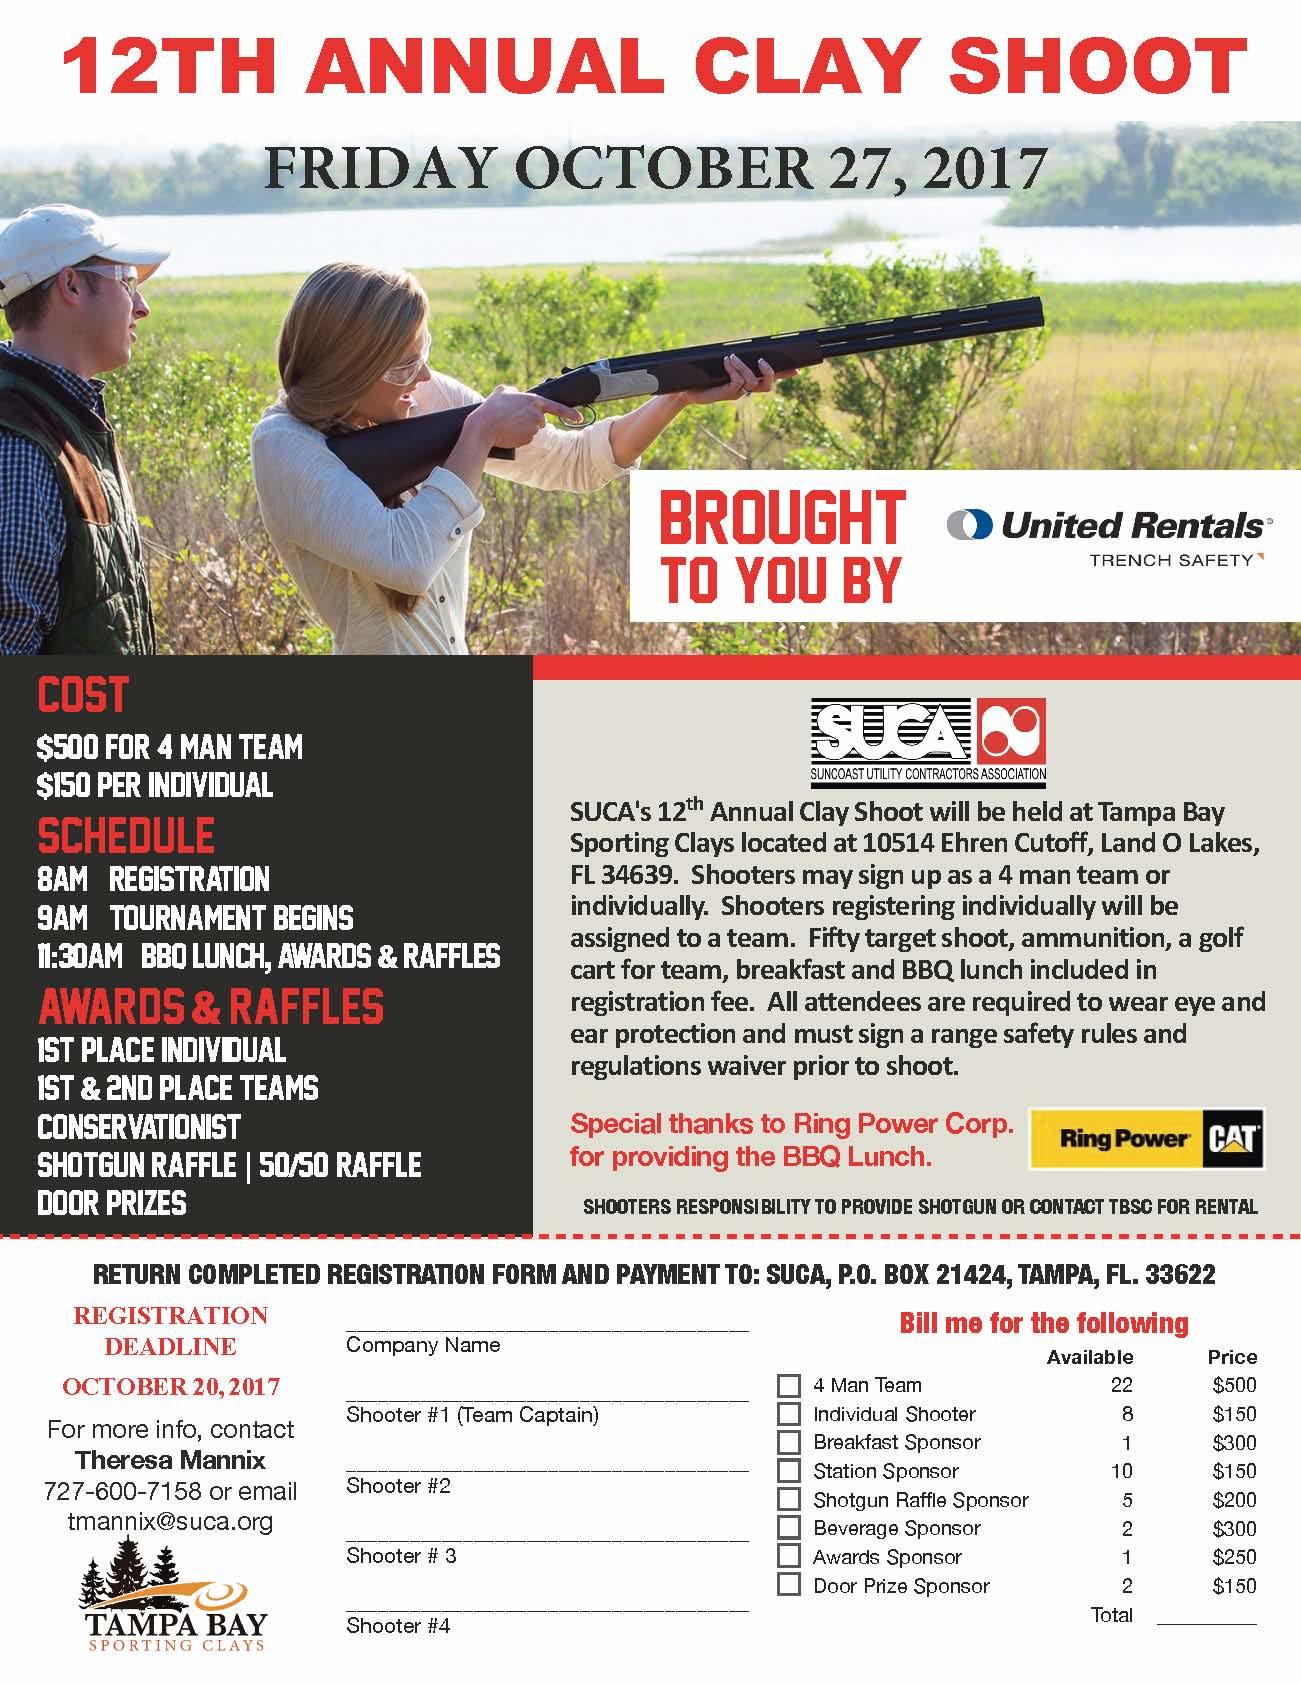 2017 SUCA 12th Annual Clay Shoot Flyer.jpg